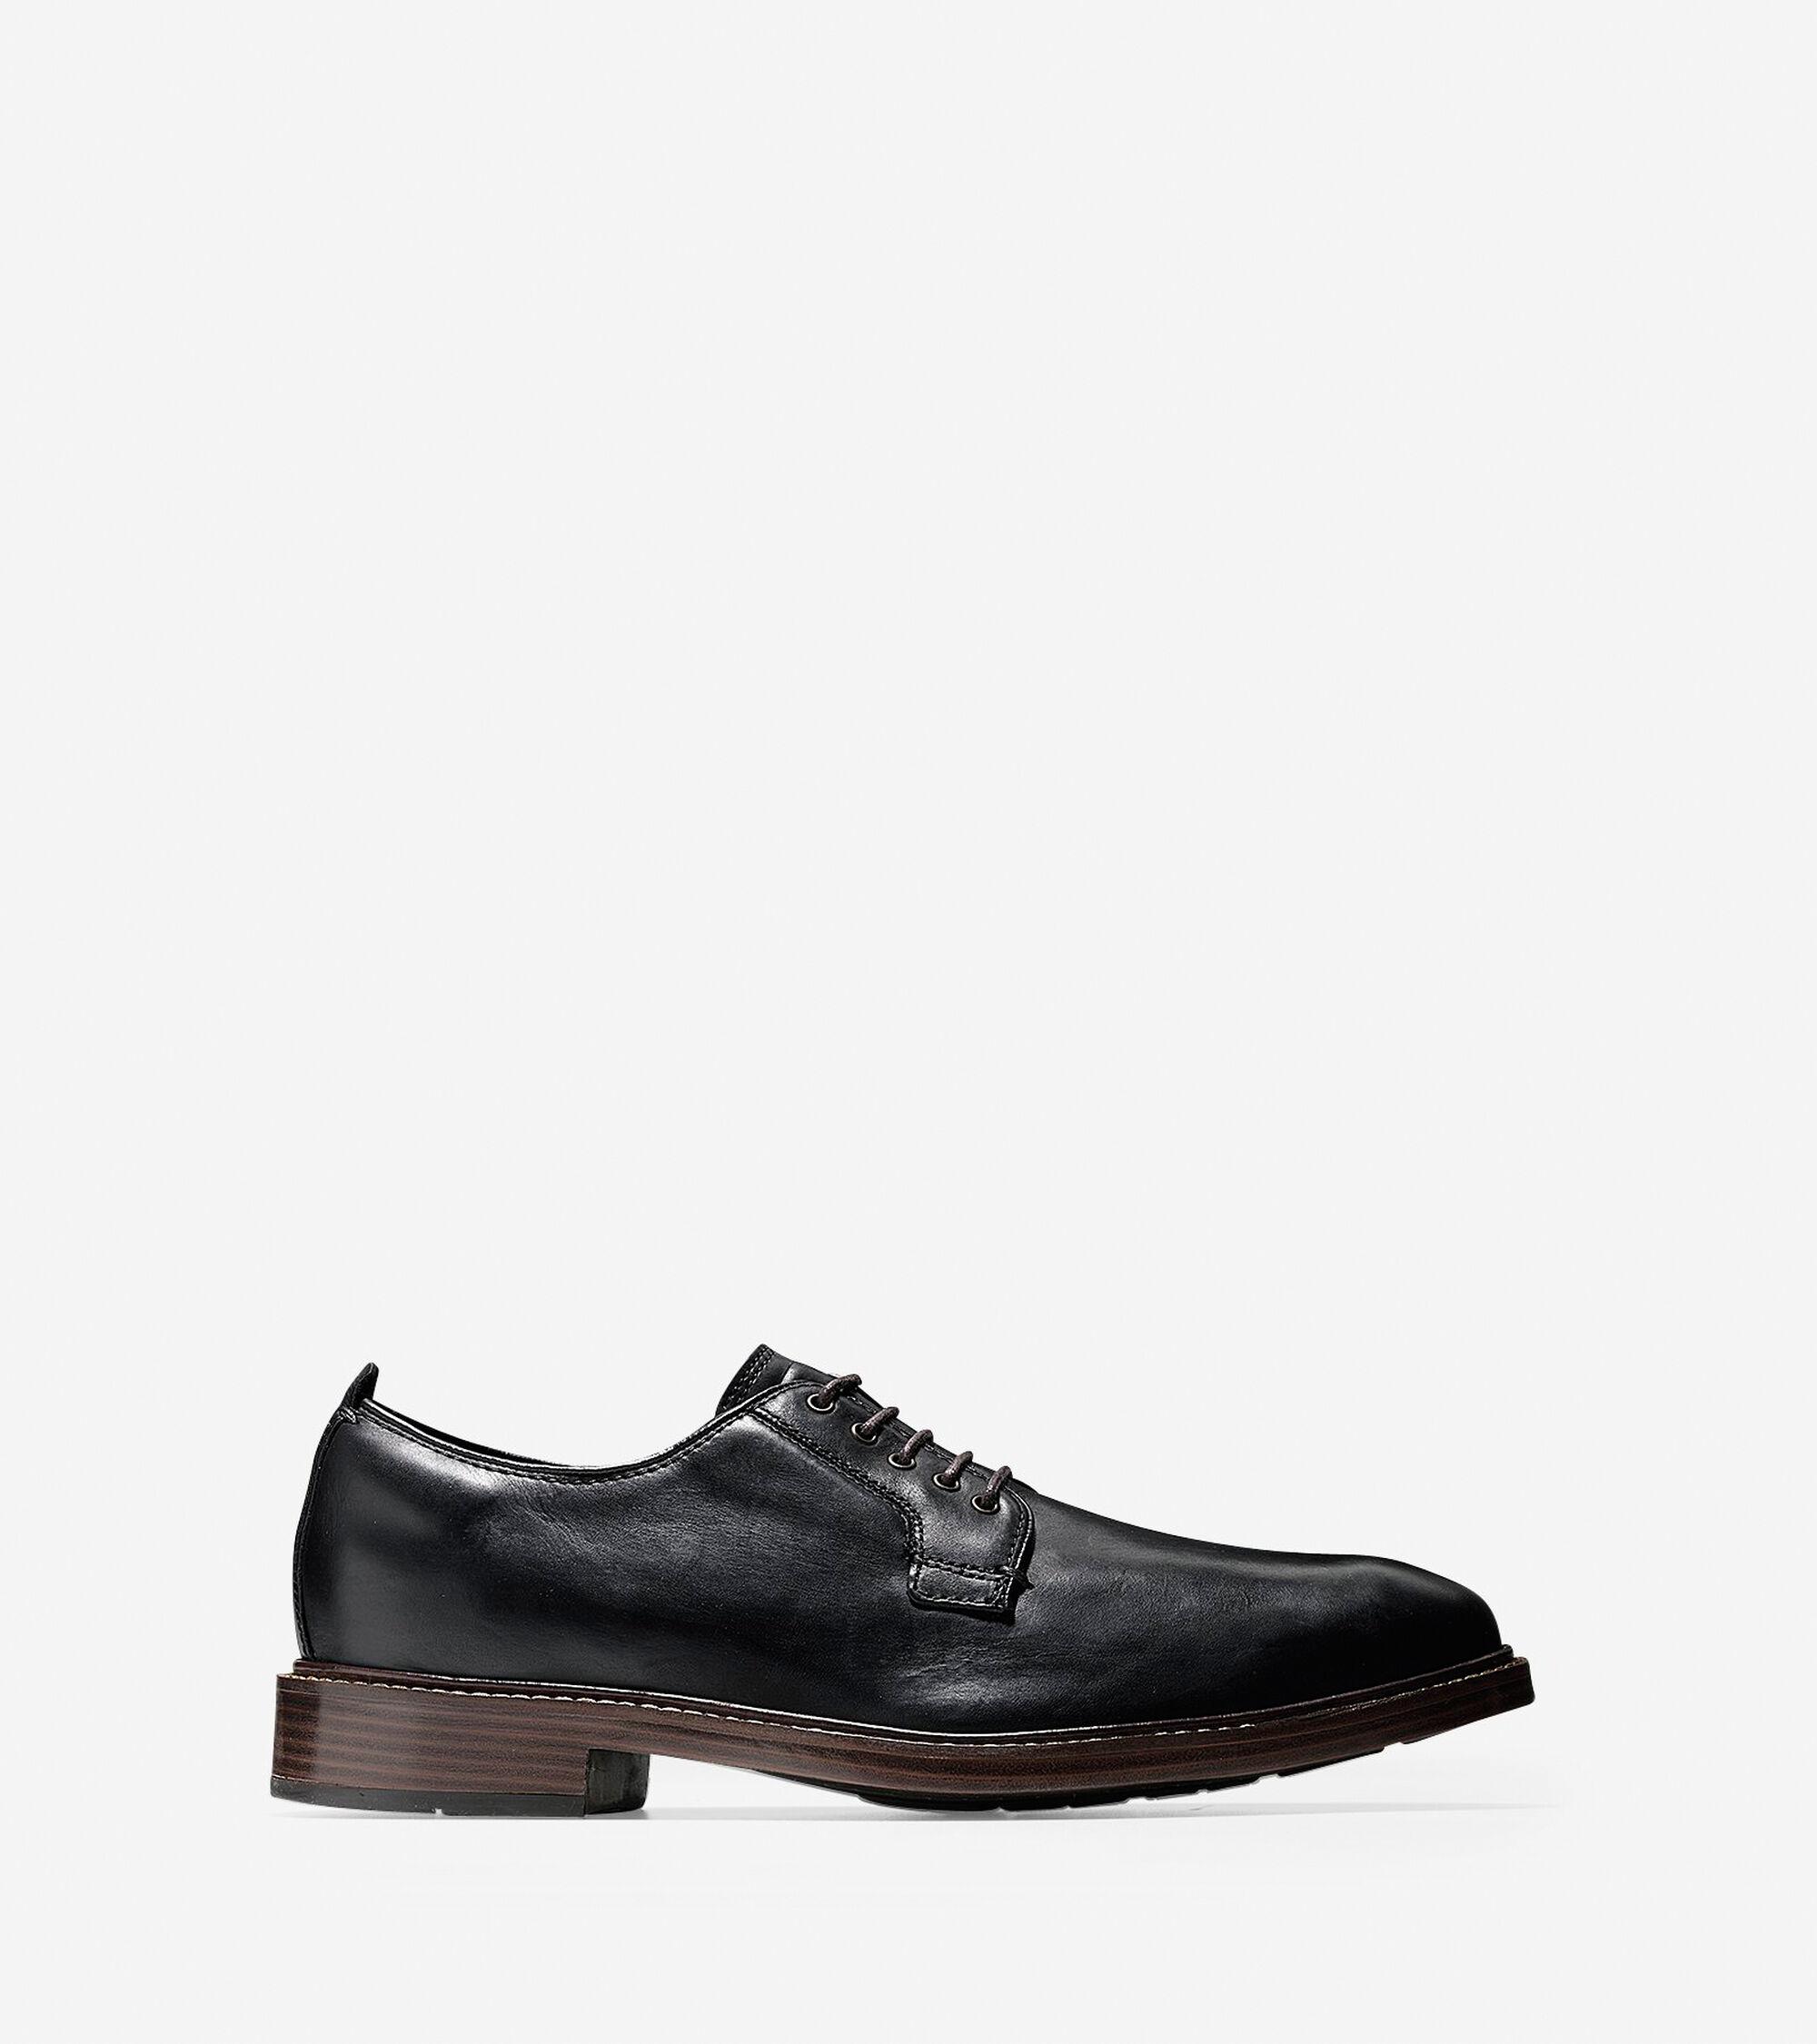 35e85b9a788 Men s Kennedy Grand Postman Oxfords in Black